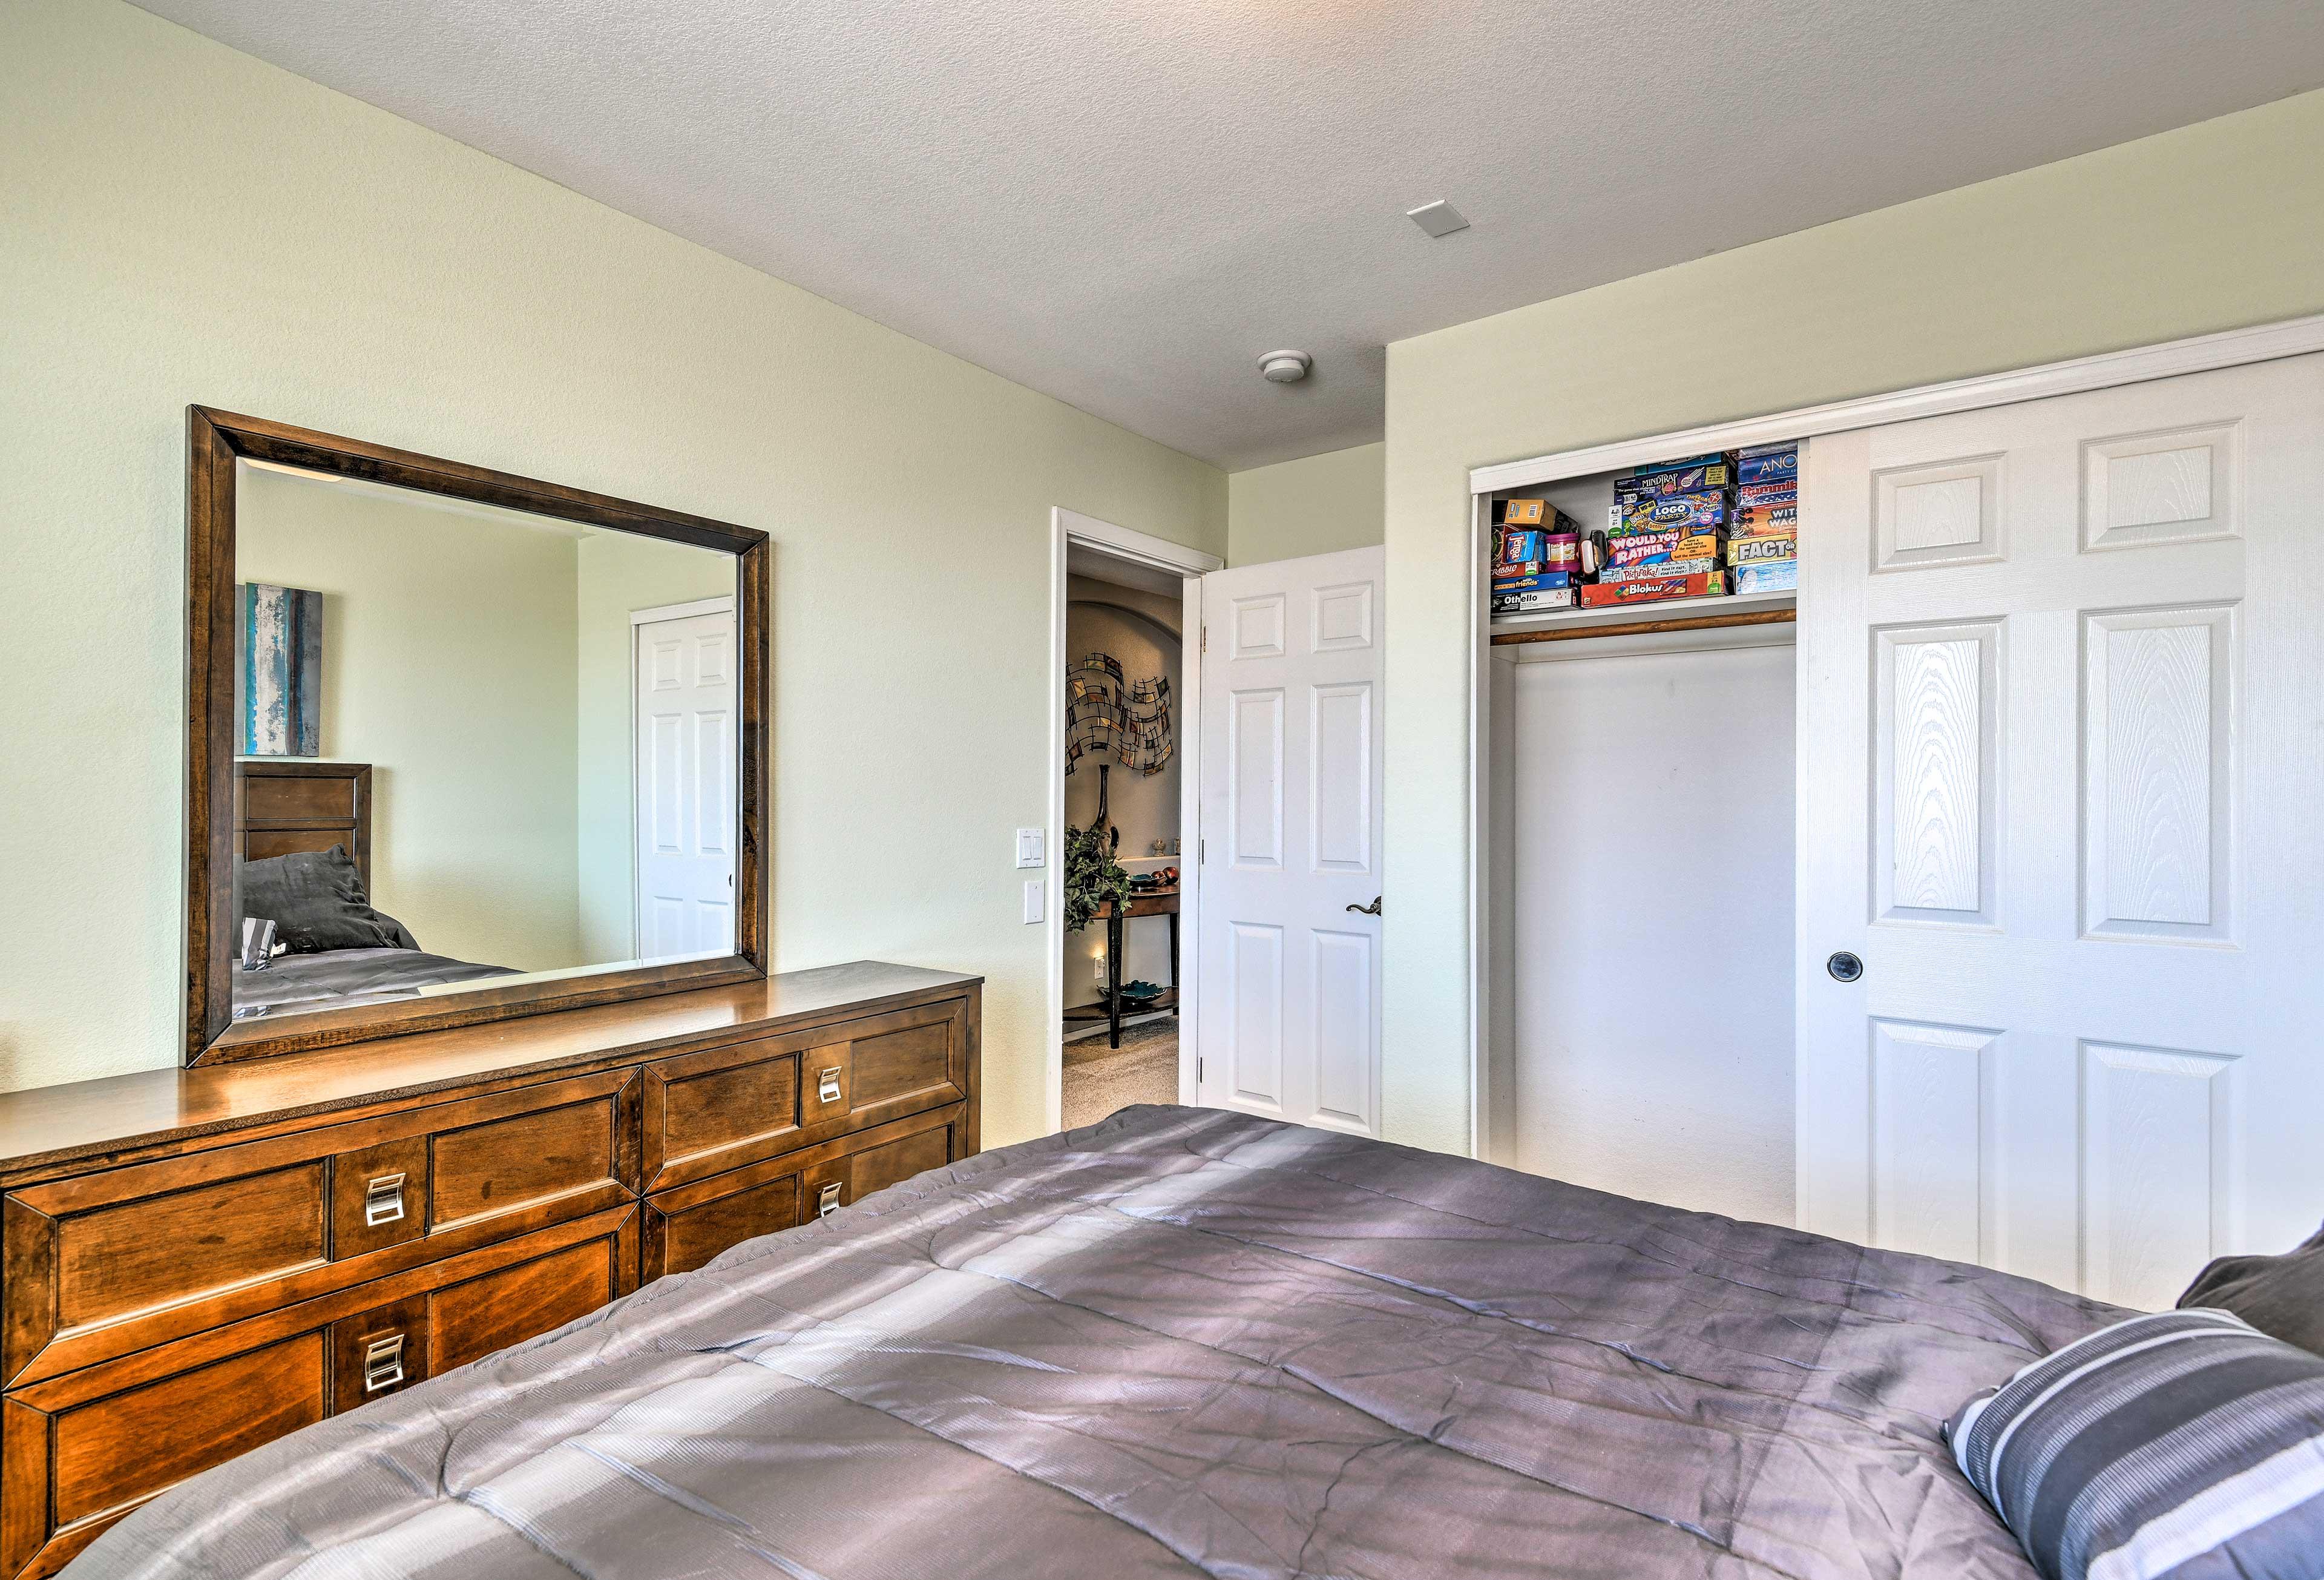 Plenty of closet space provided!